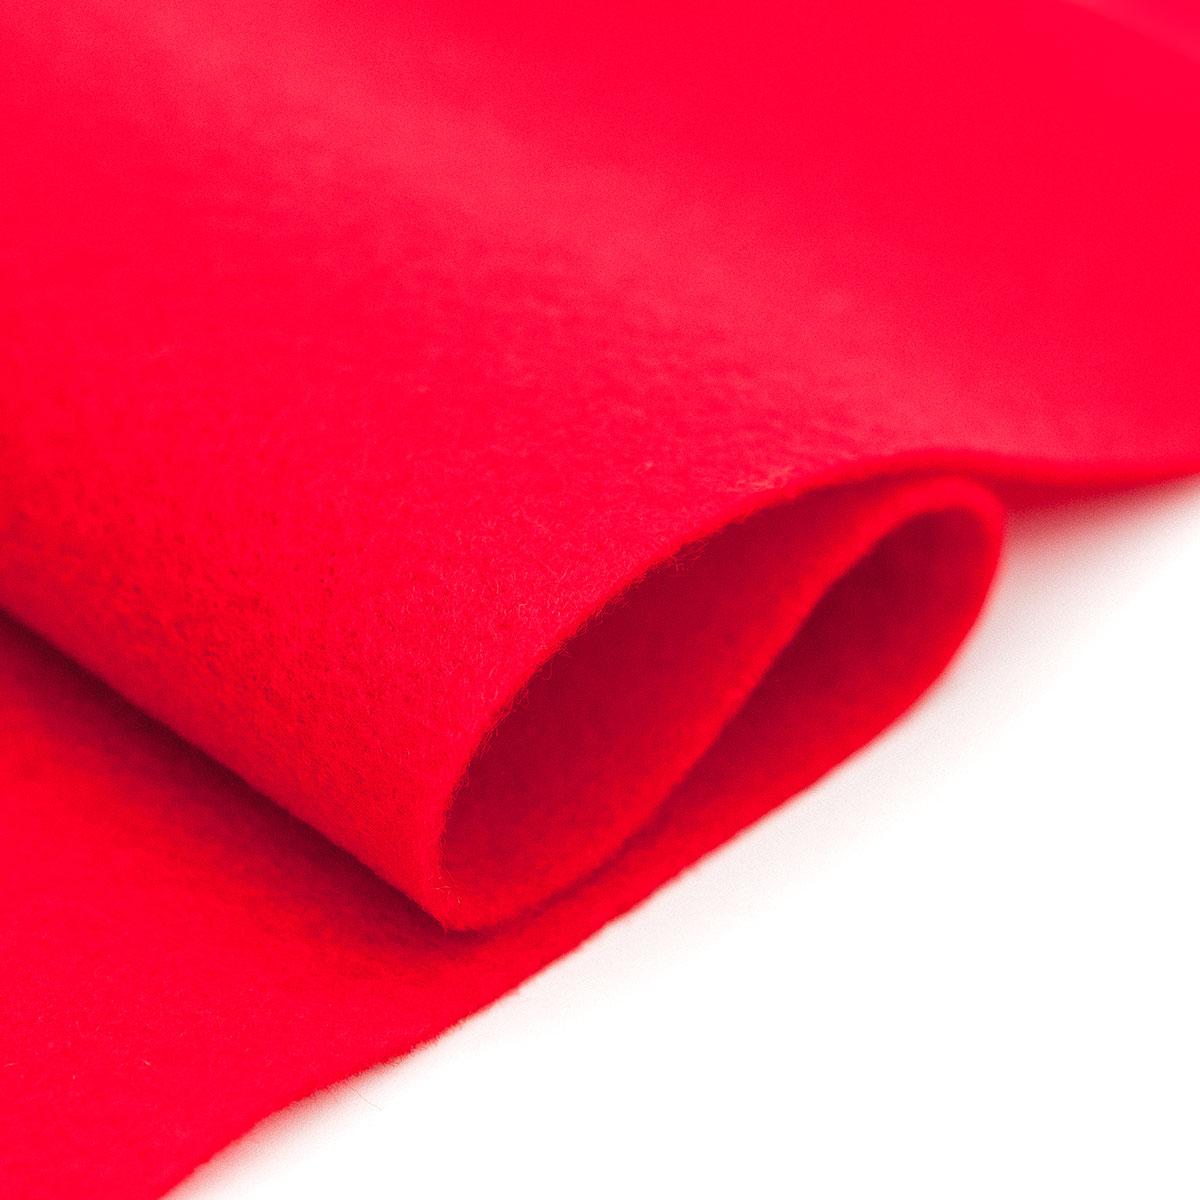 61212664 Фетр для творчества, красный, 2мм, 20x30см, уп./1шт. Glorex